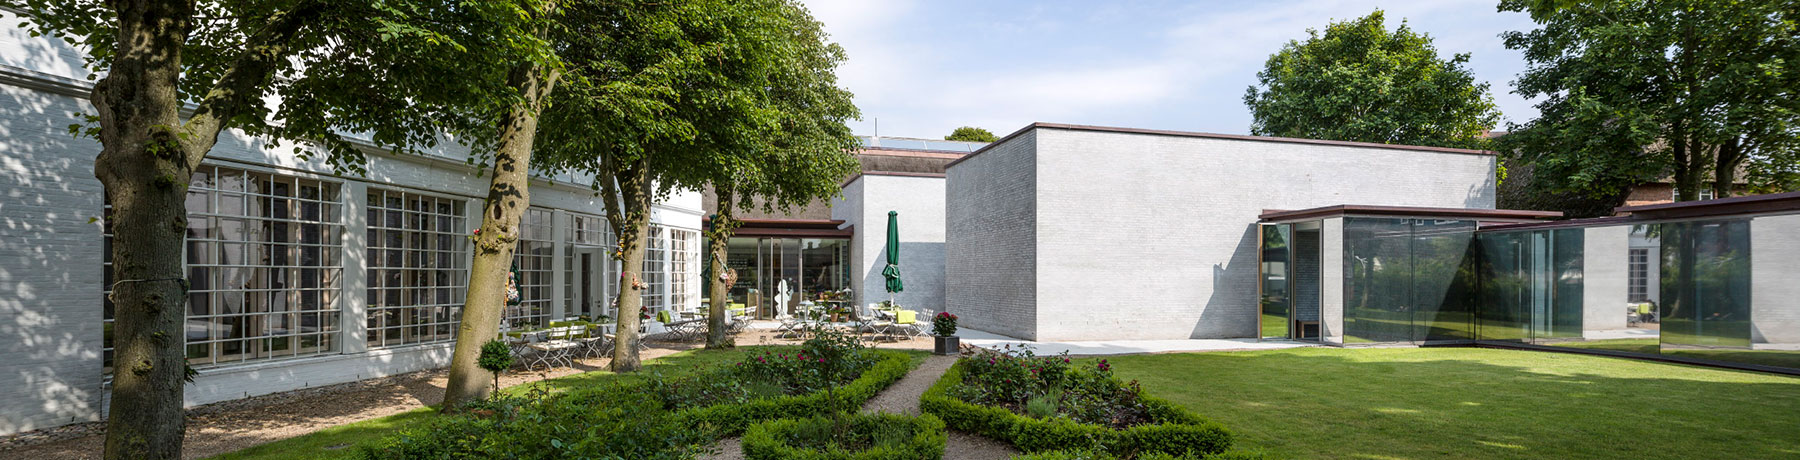 Museum Kunst der Westküste - Landhaus Altes Pastorat